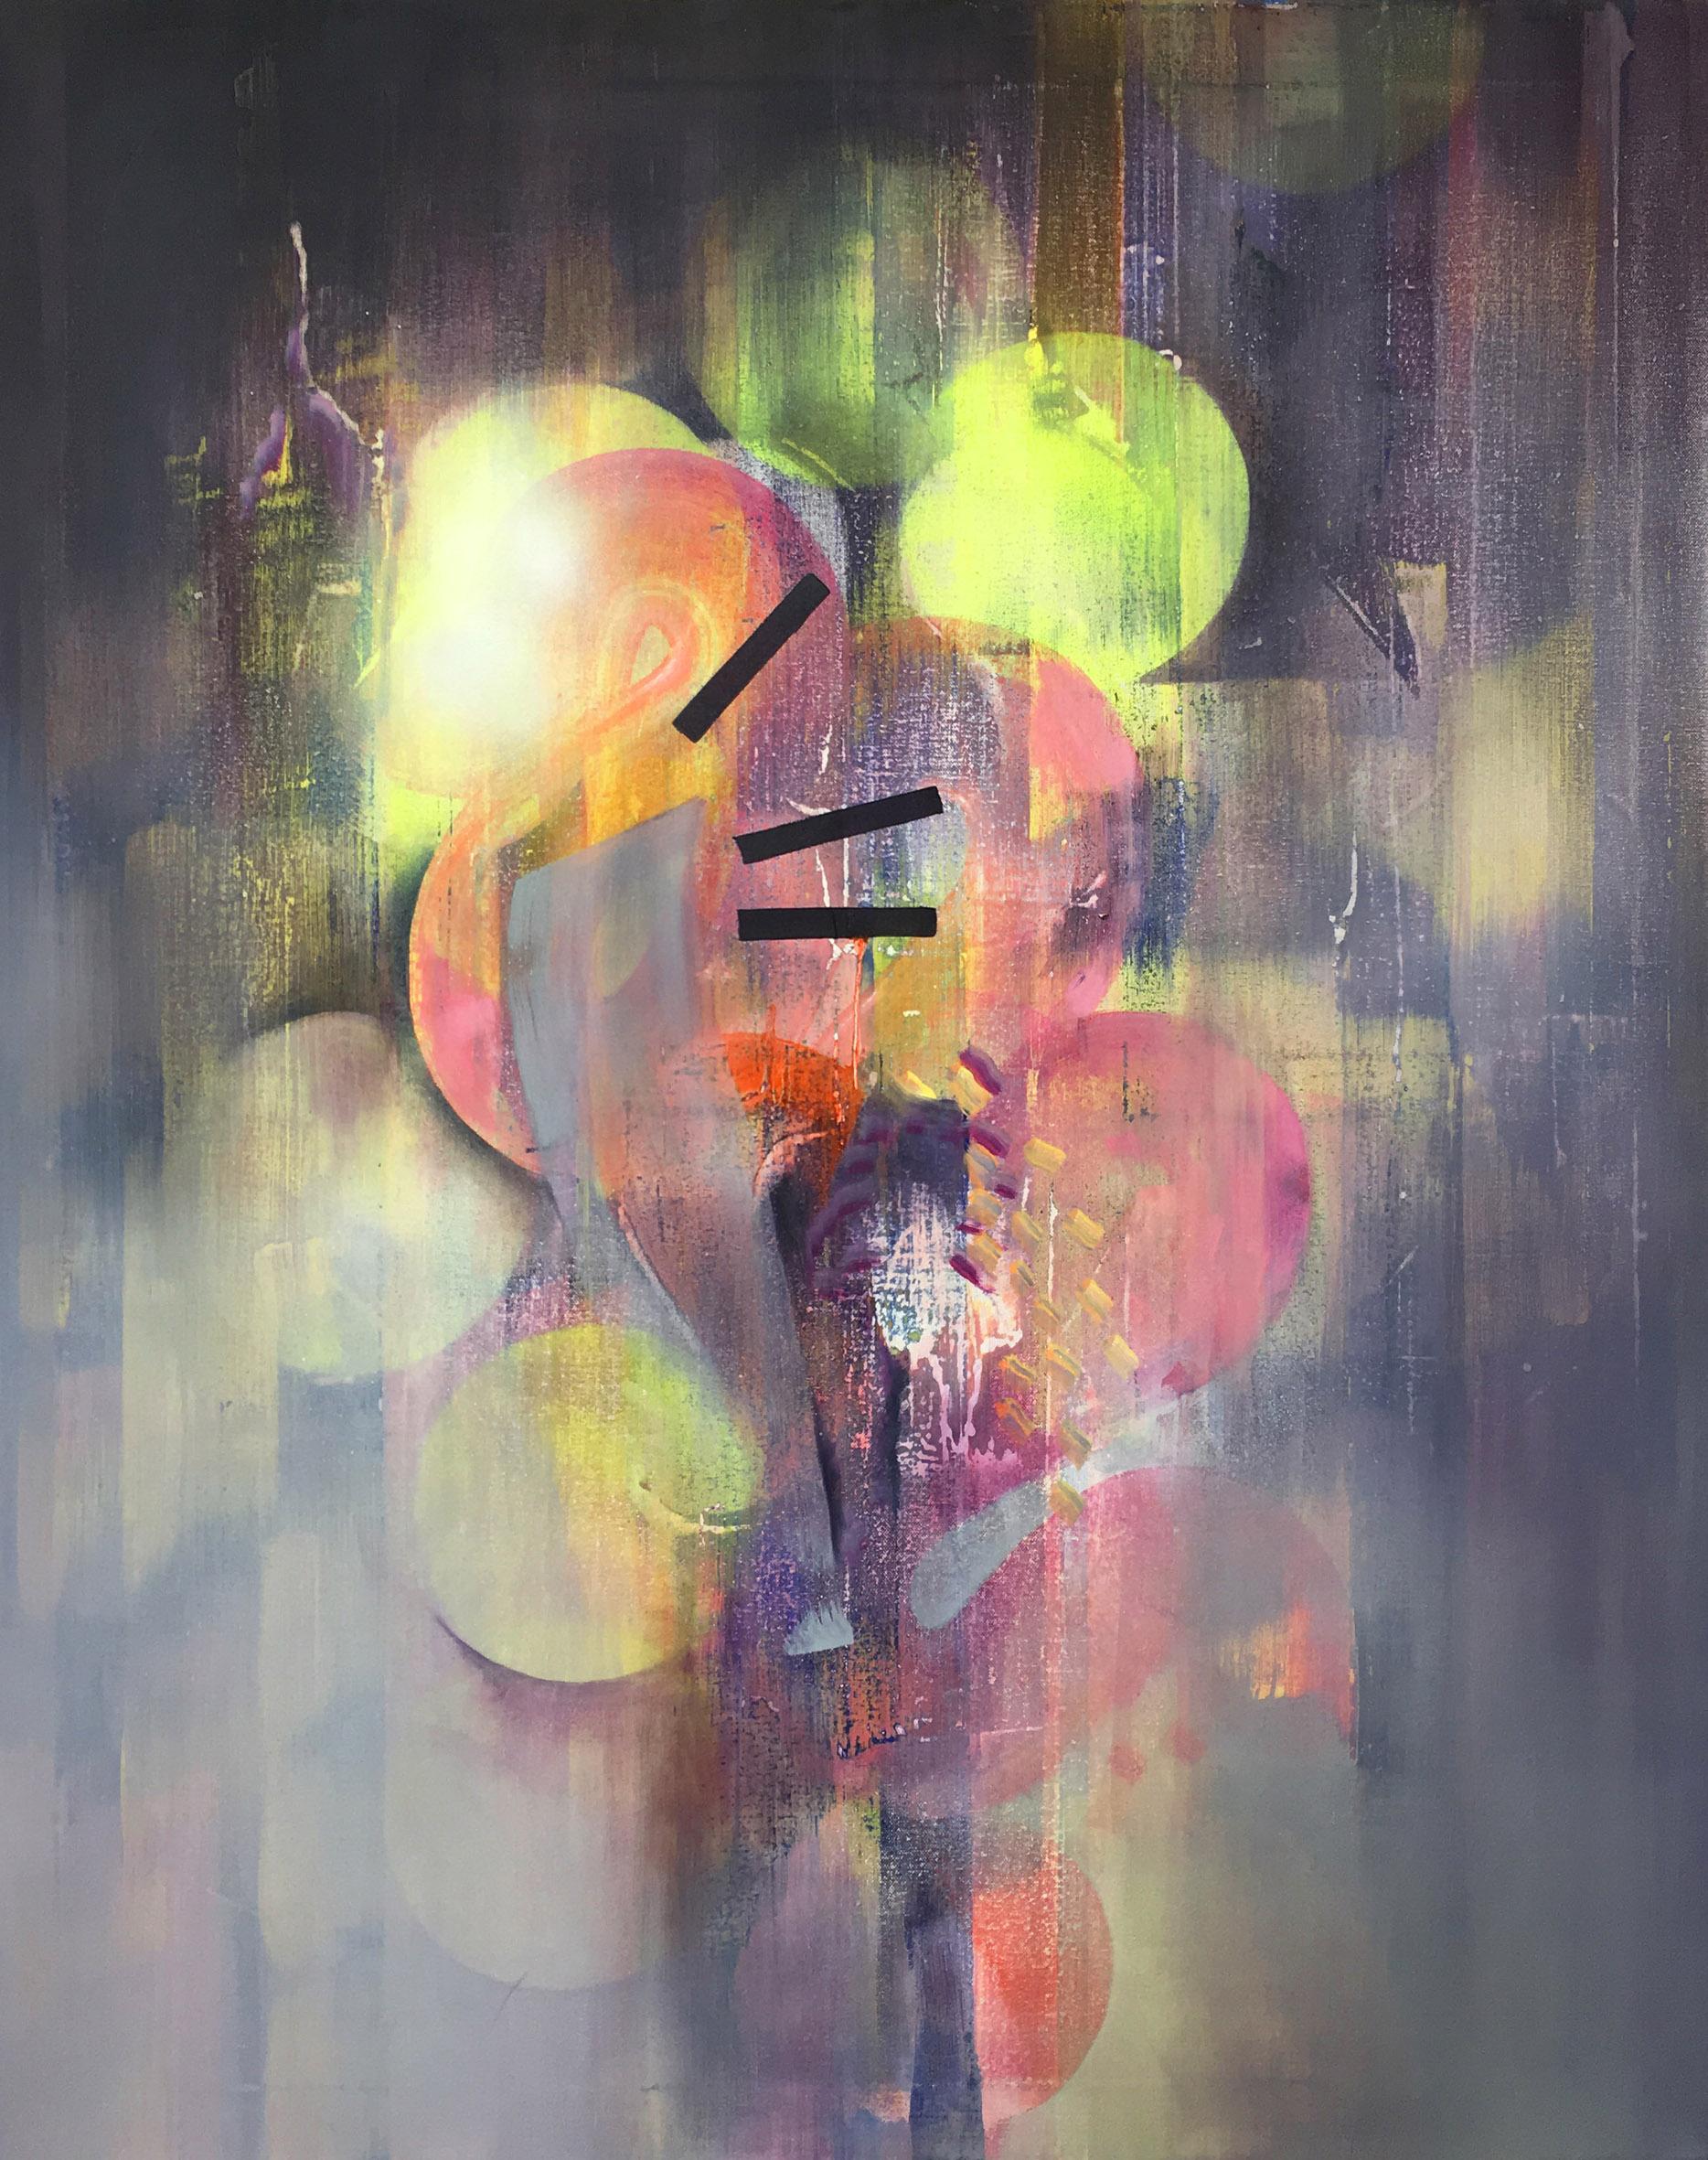 Valleys, 76cm x 61cm, oil on canvas, 2016